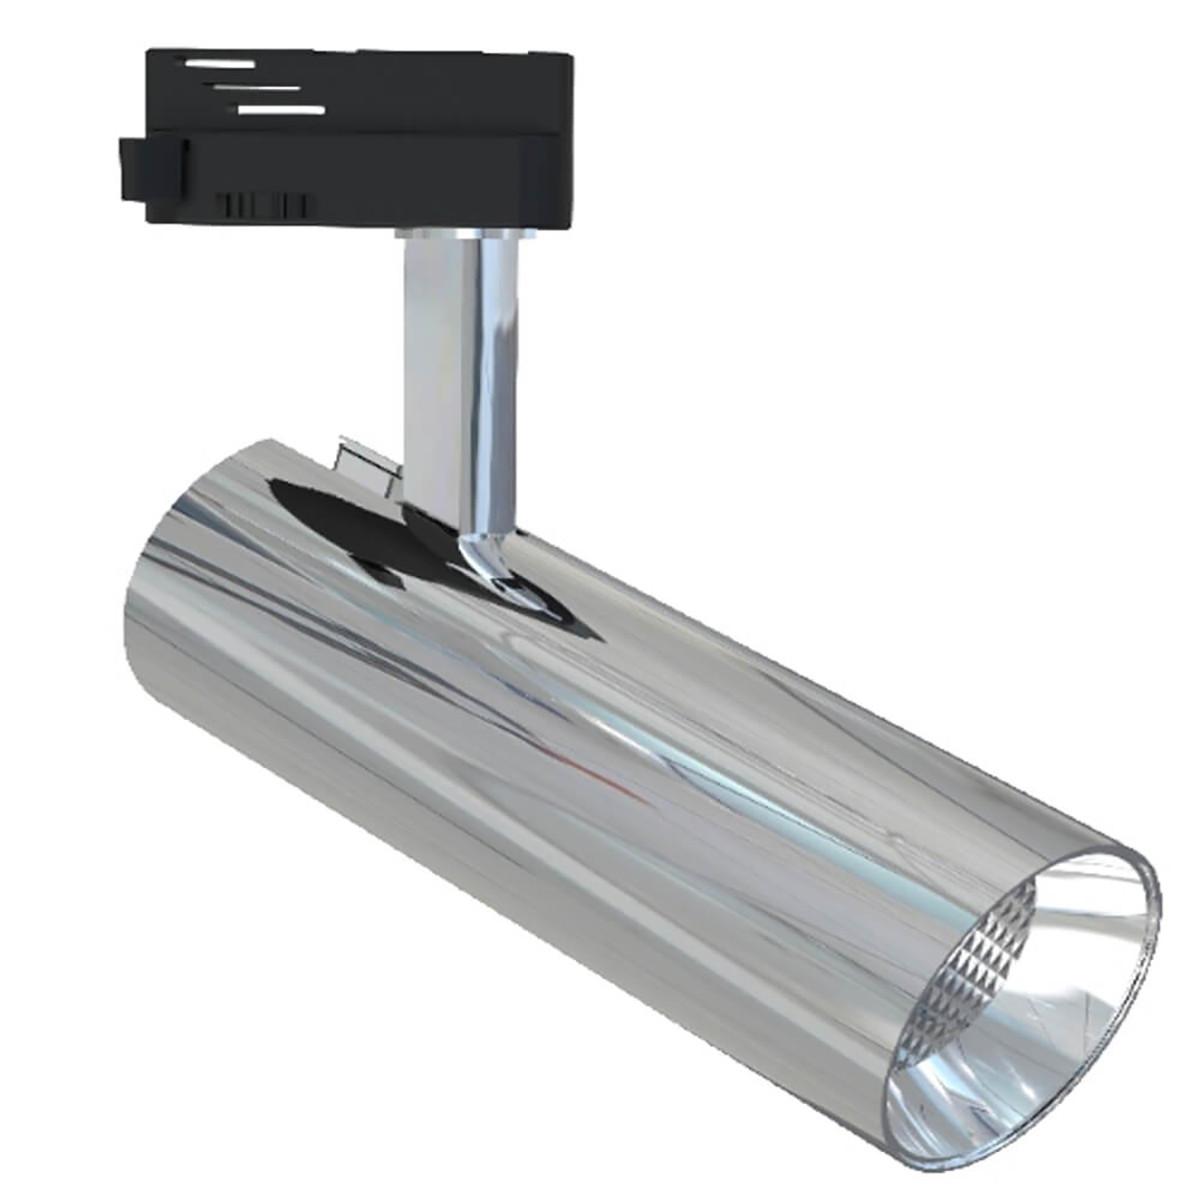 LED Railverlichting - Track Spot - Facto - 30W 1 Fase - Rond - Warm Wit 3000K - Glans Chroom Alumini